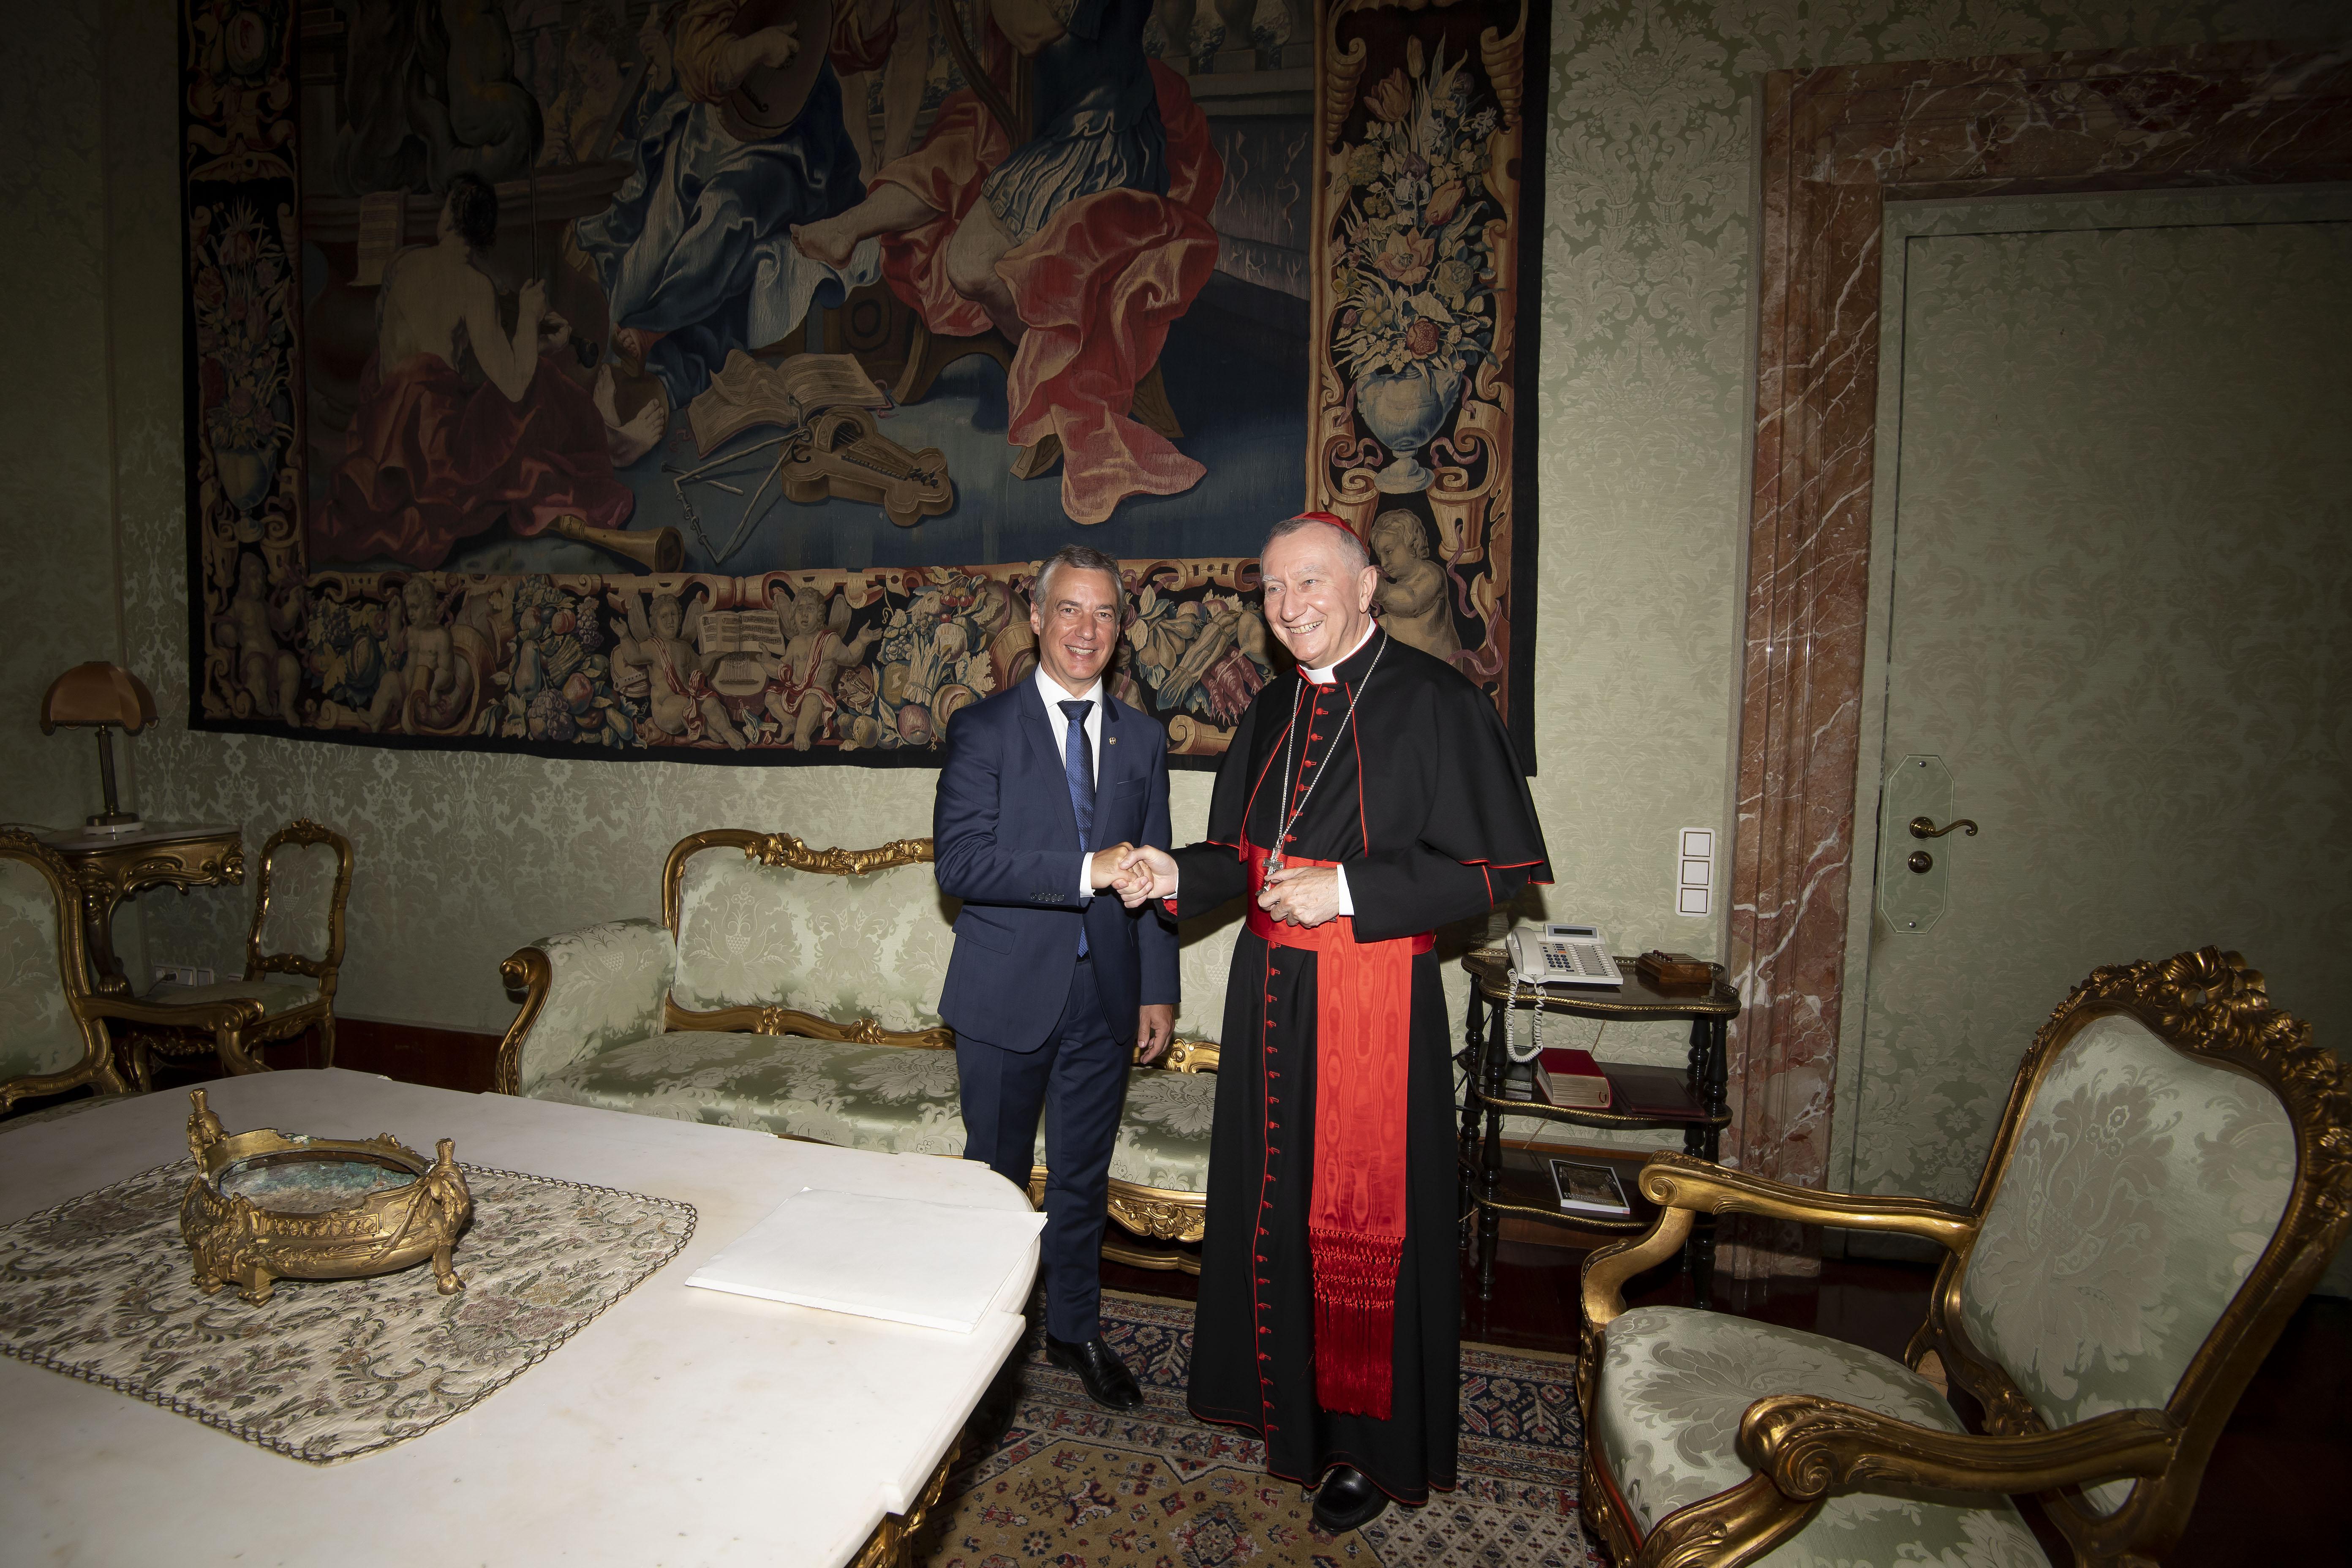 2019_08_28_lhk_secretario_estado_vaticano_05.jpg